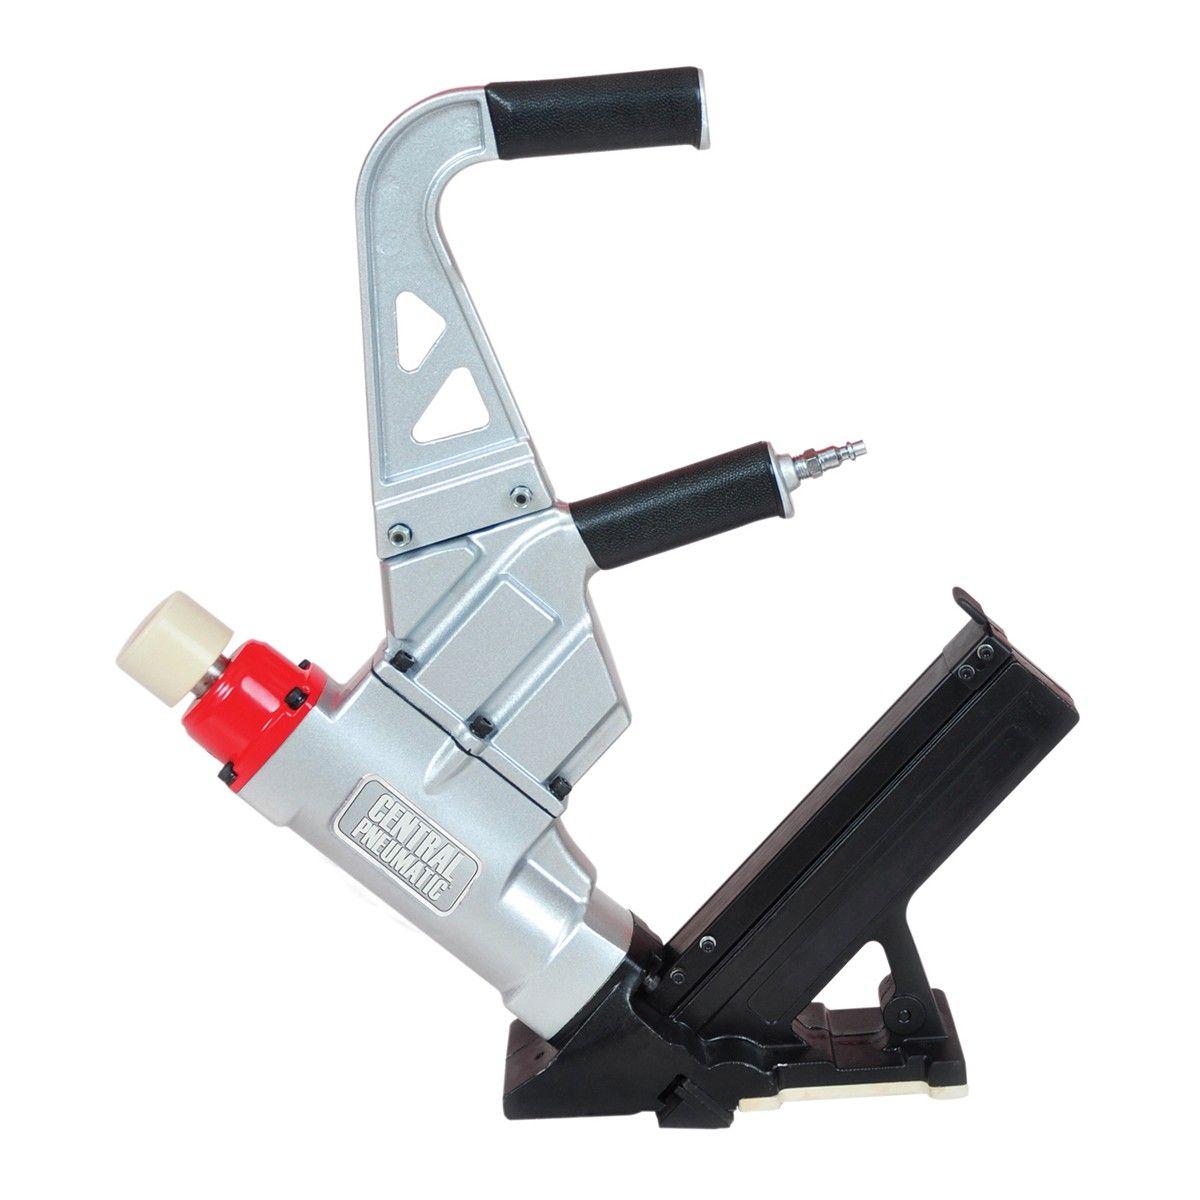 2 In 1 Flooring Nailer Stapler With Images Air Nailer Air